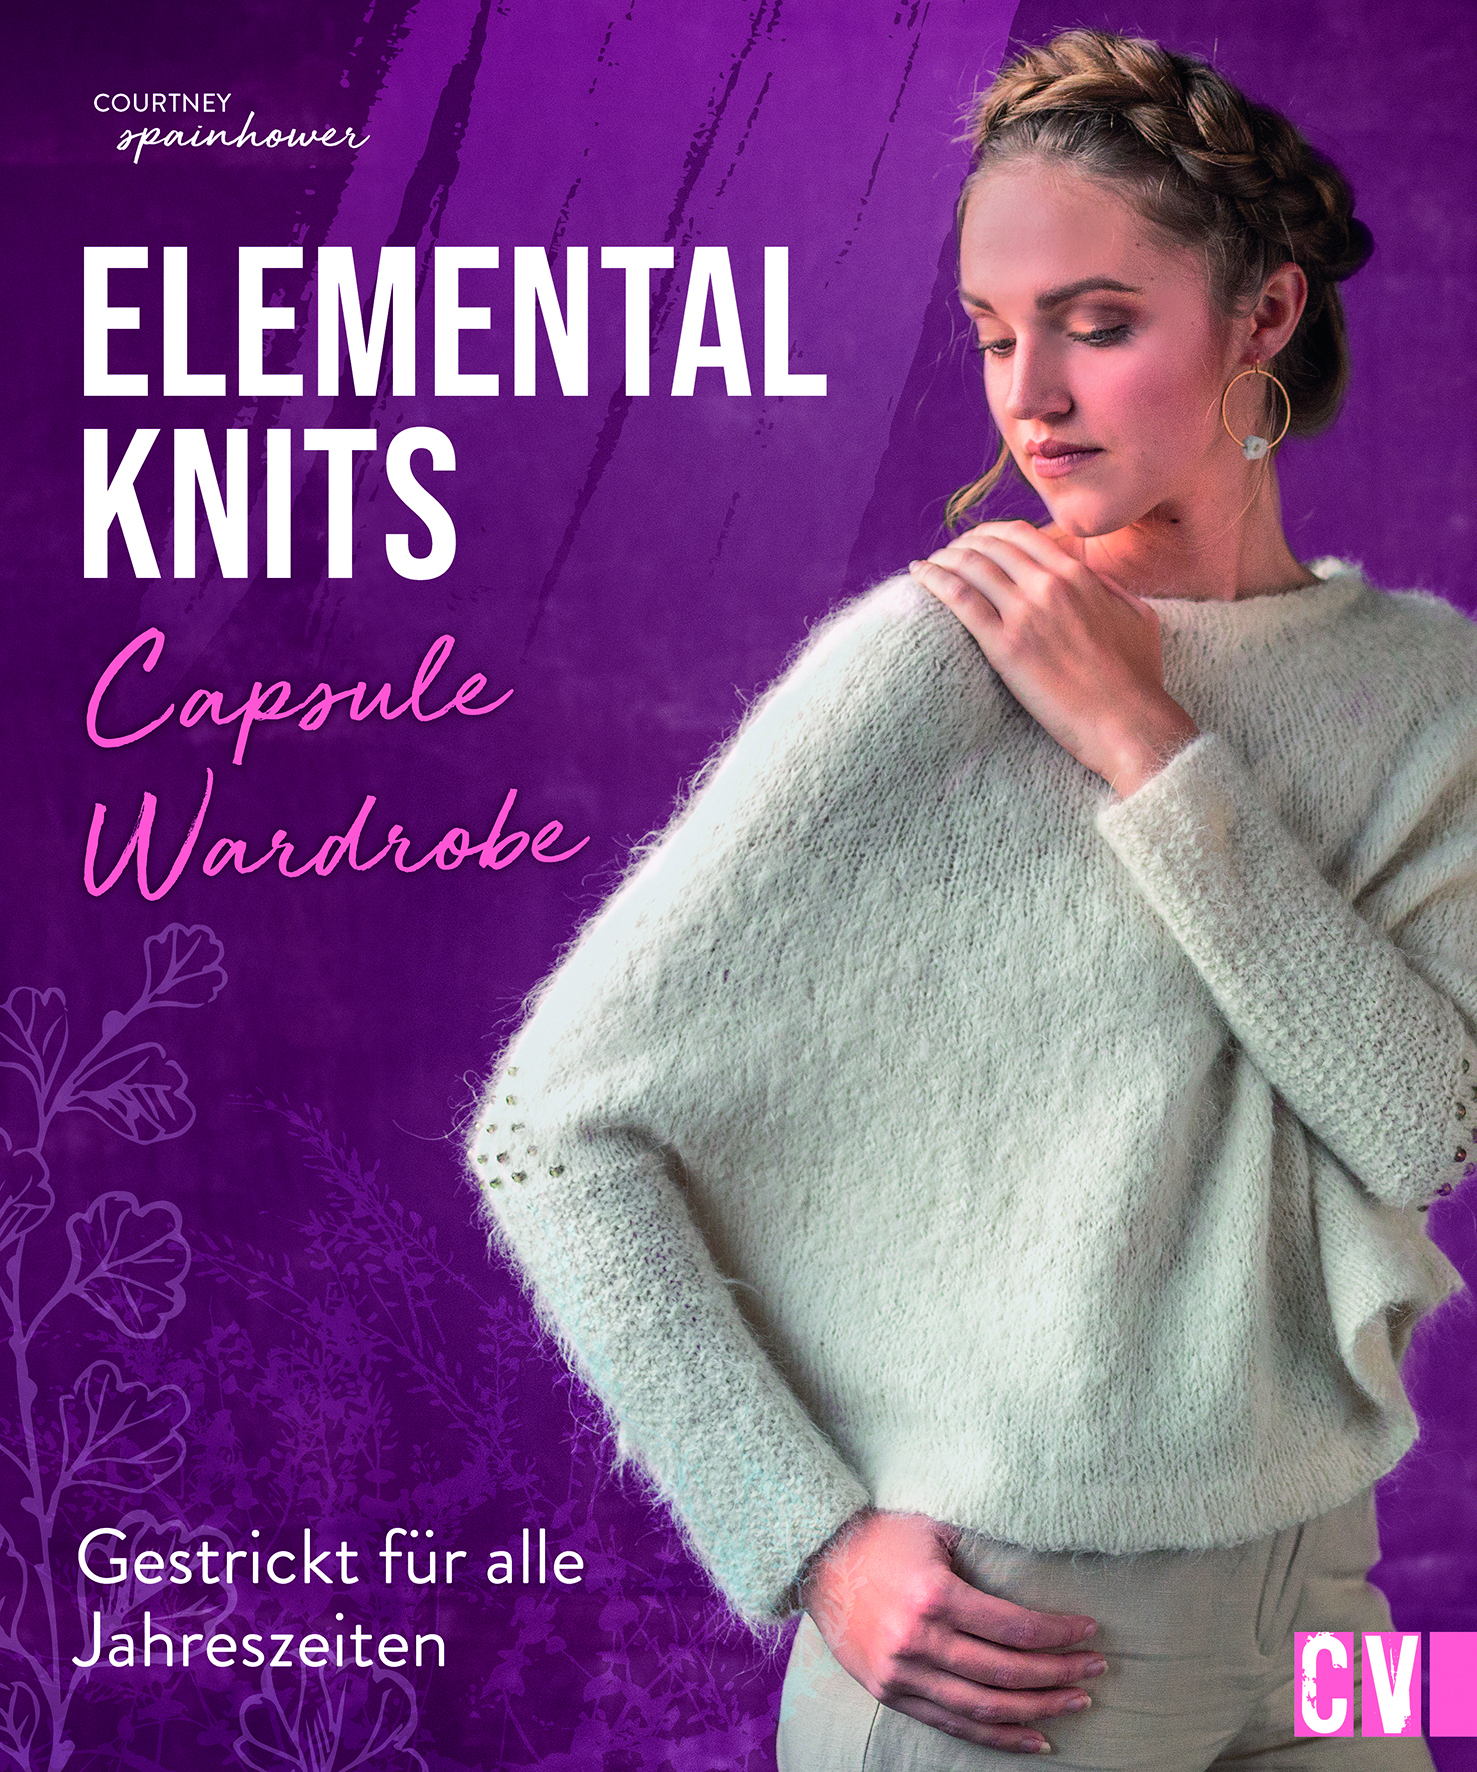 CV 6611 Elemental knits